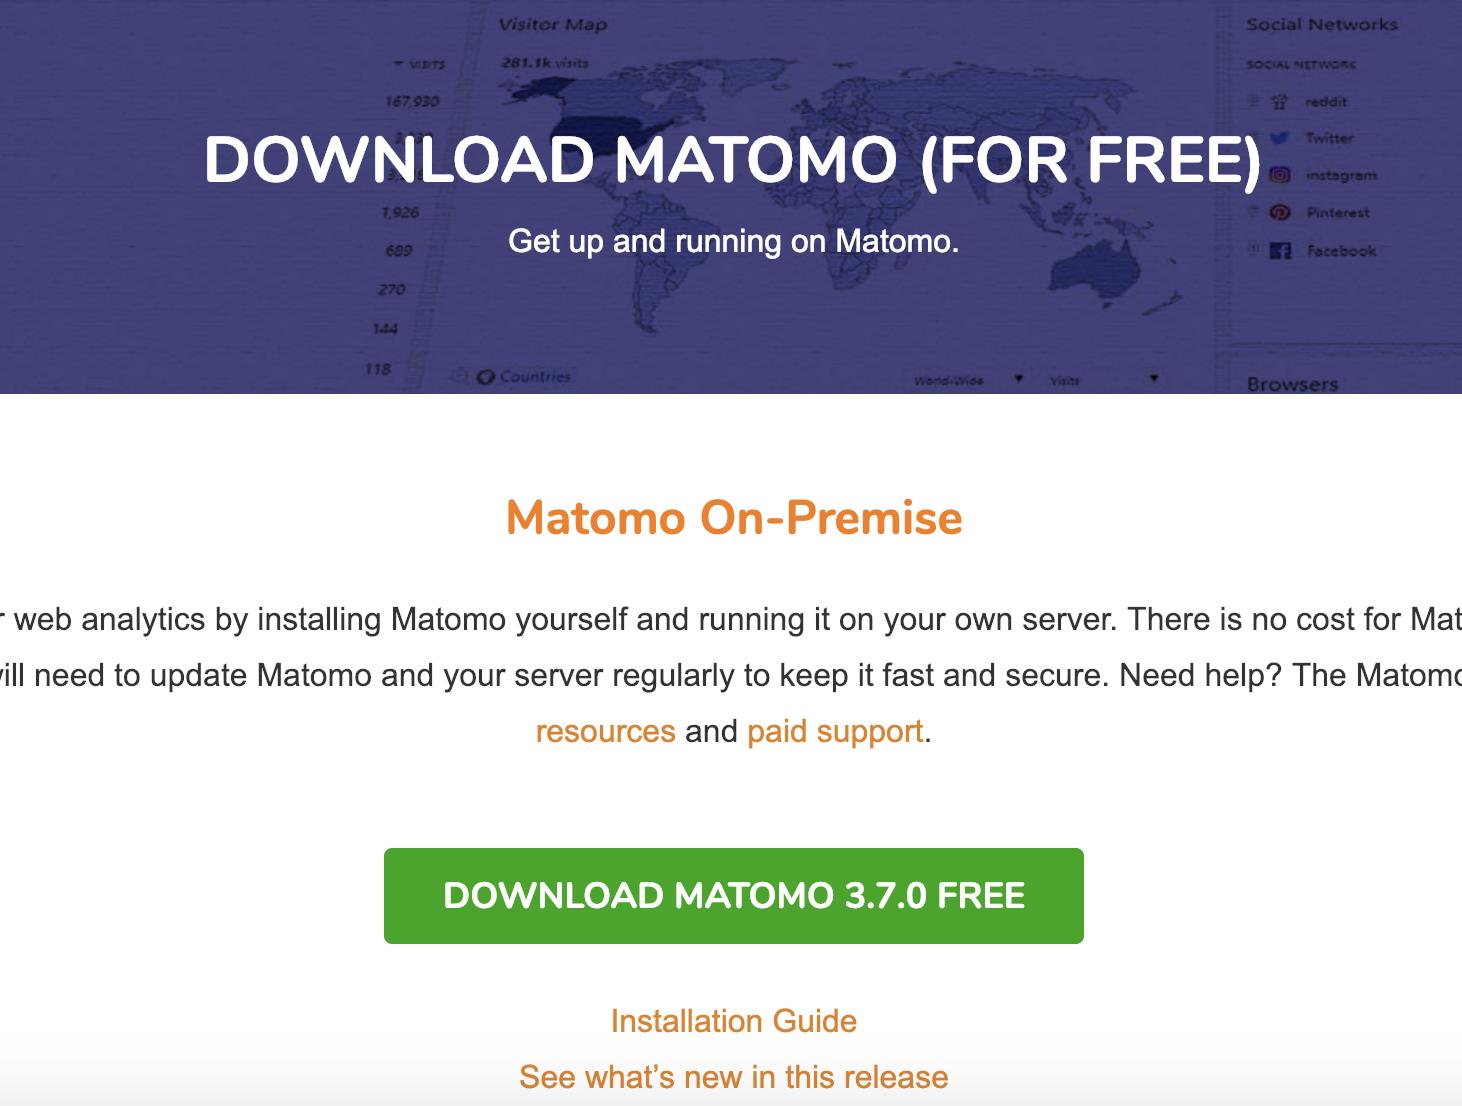 Download Matomo Free Web Analytics Tool - #1 Open Source